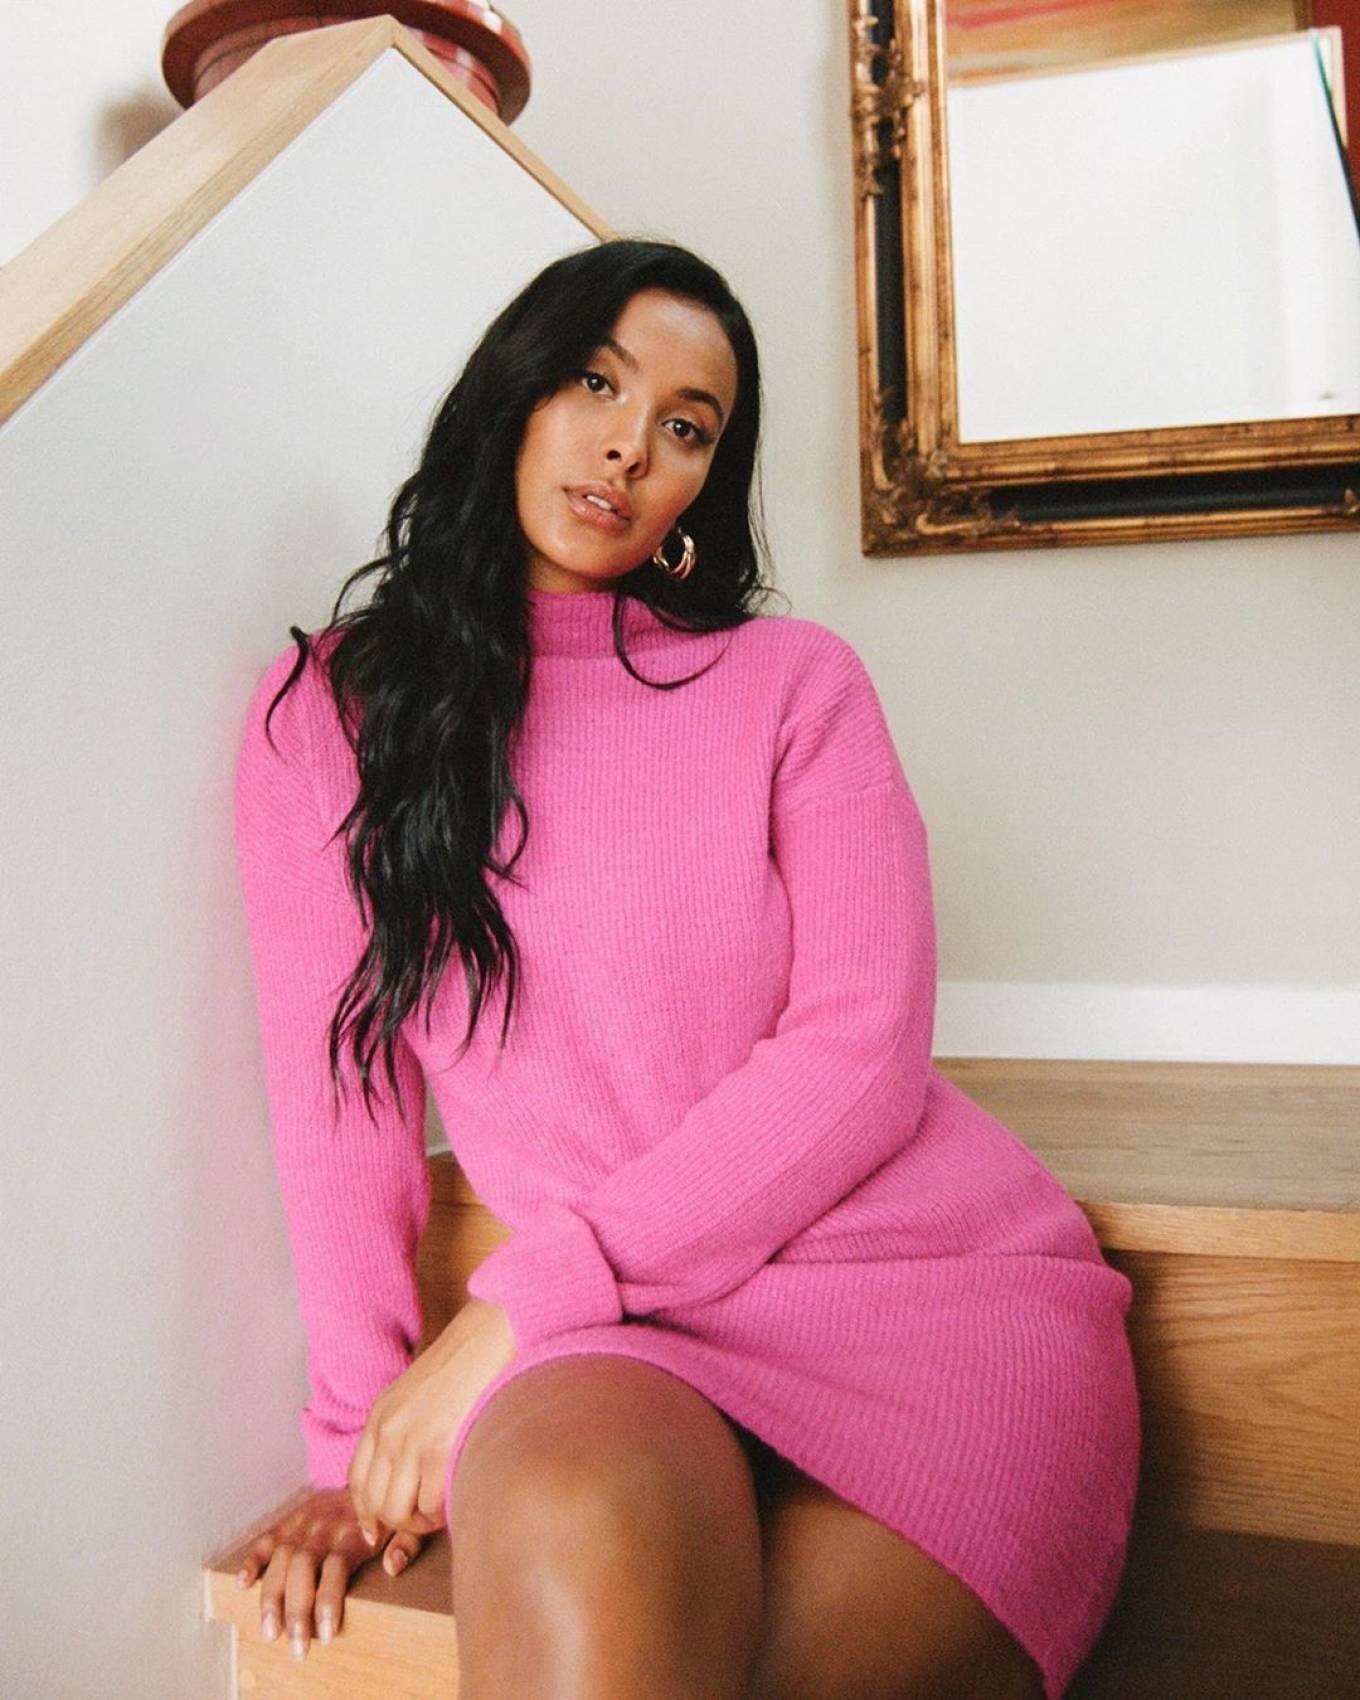 Maya Jama - Photoshoot for an interview with the Guardian (Jun 2020)